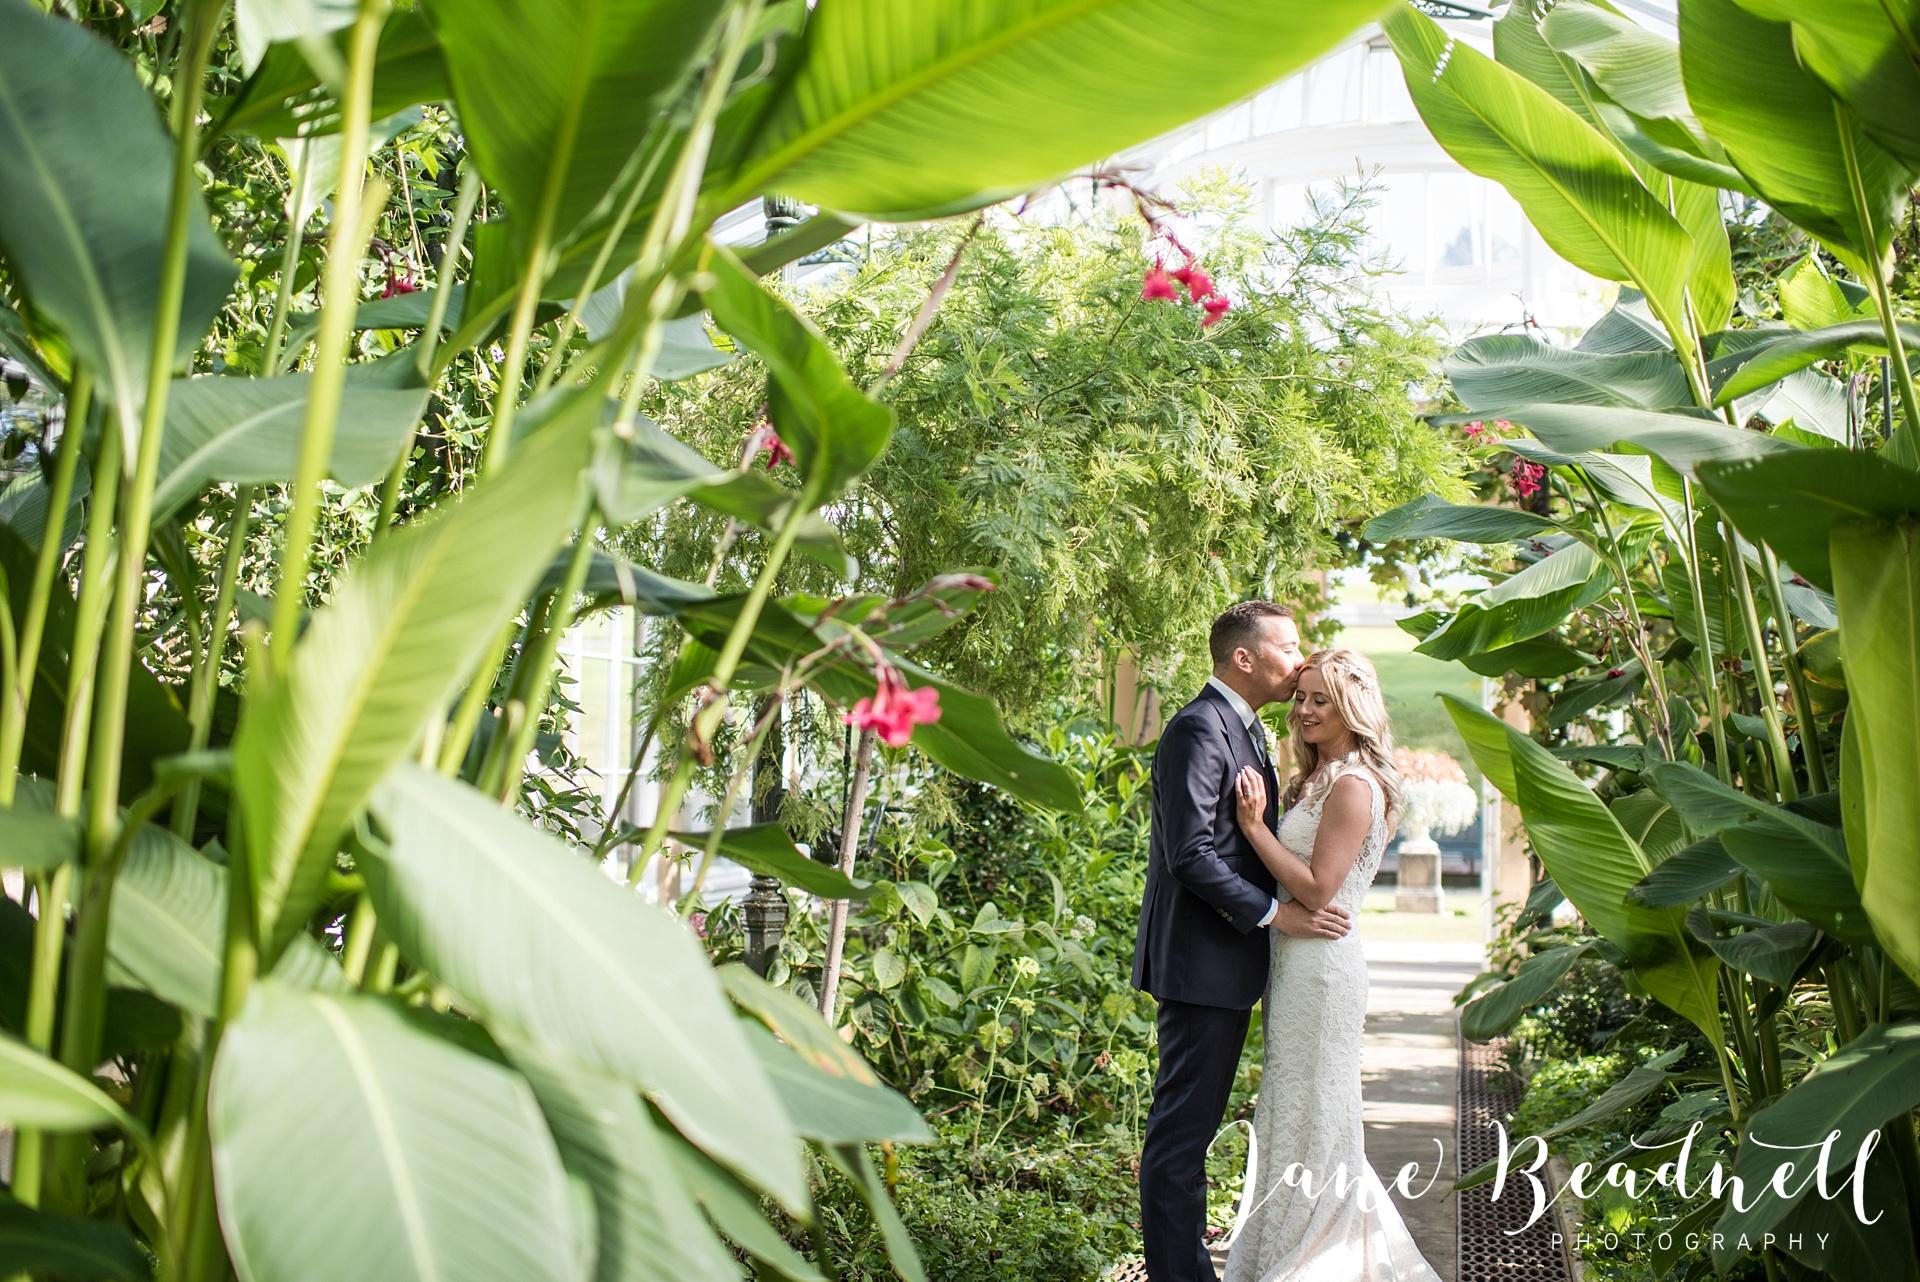 Broughton Hall wedding photography by Yorkshire wedding photographer Jane Beadnell Photography. Leeds wedding photographer